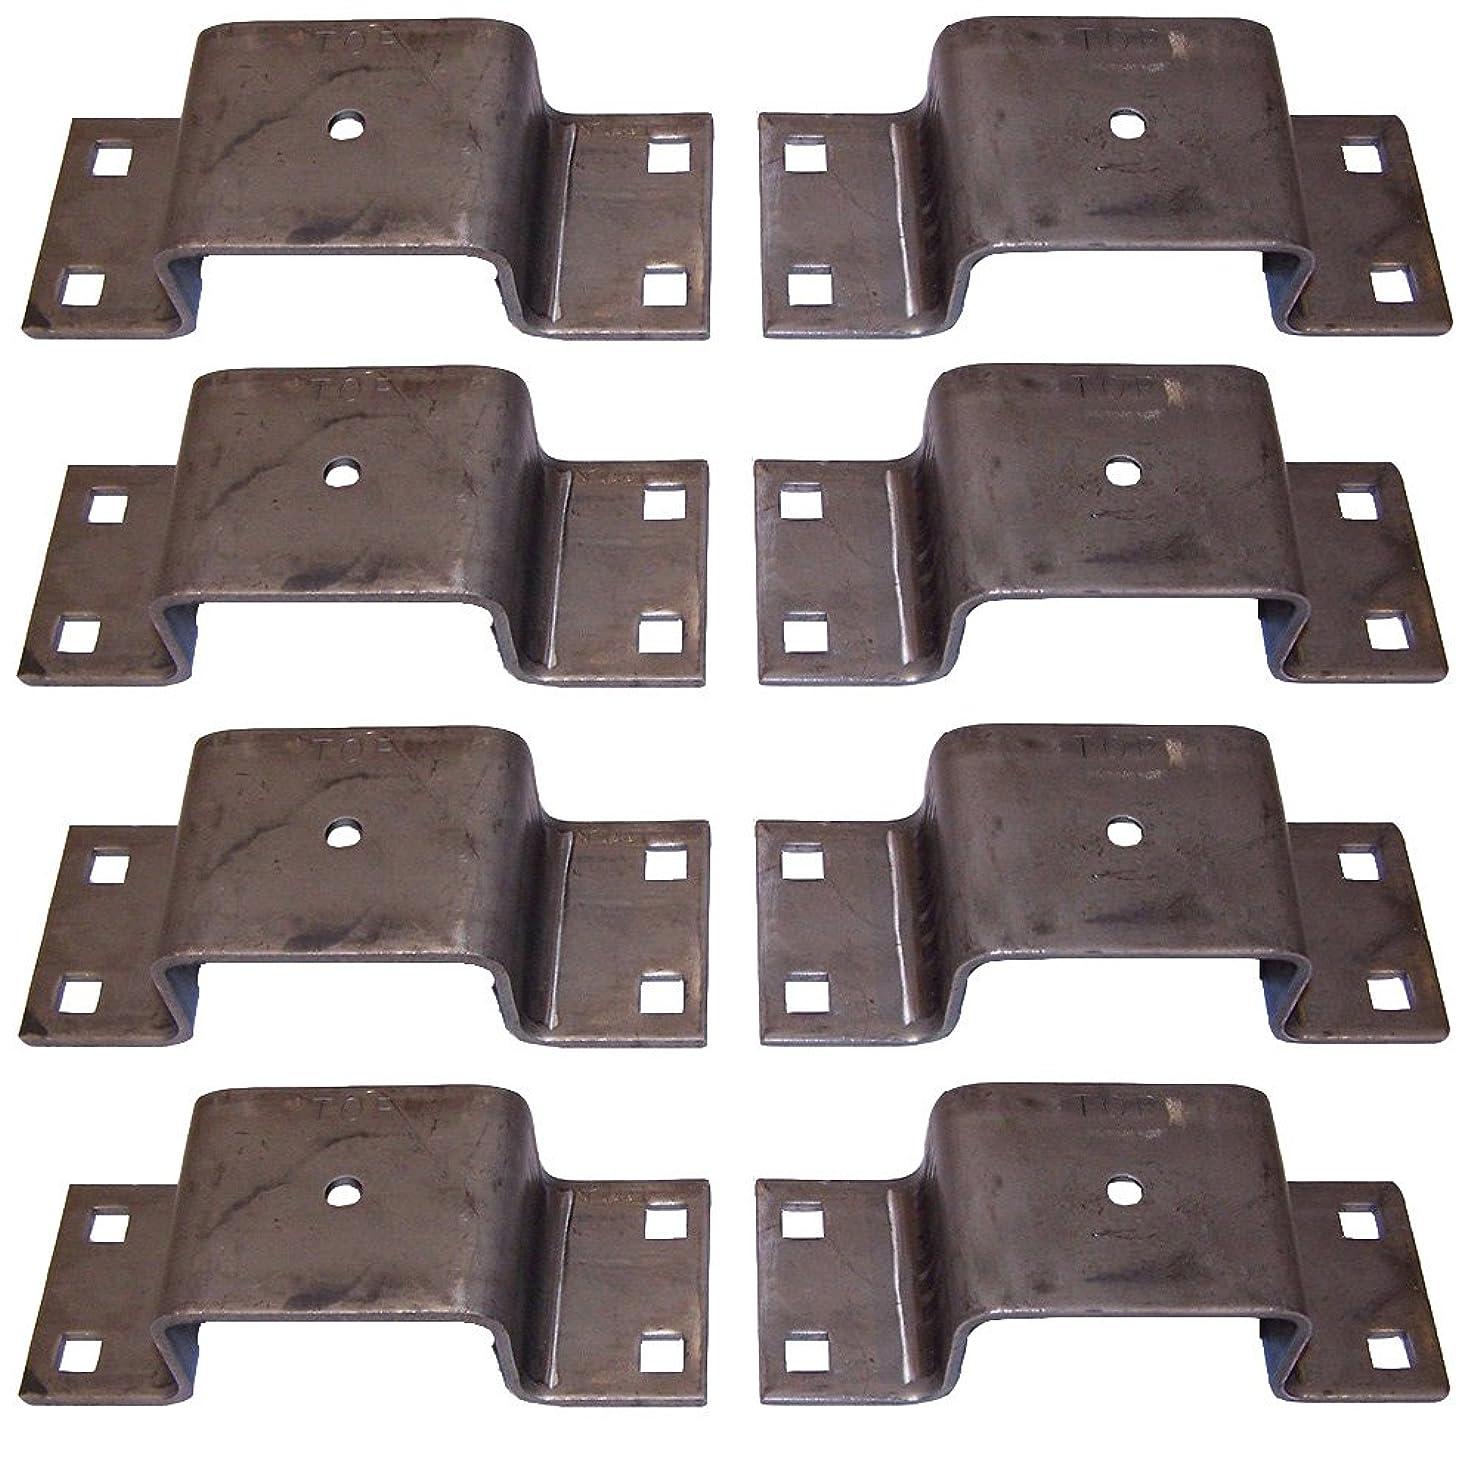 (8) 10.5 Gauge Bolt-On Tapered Stake Pocket for Trucks/Trailers/Board Holders